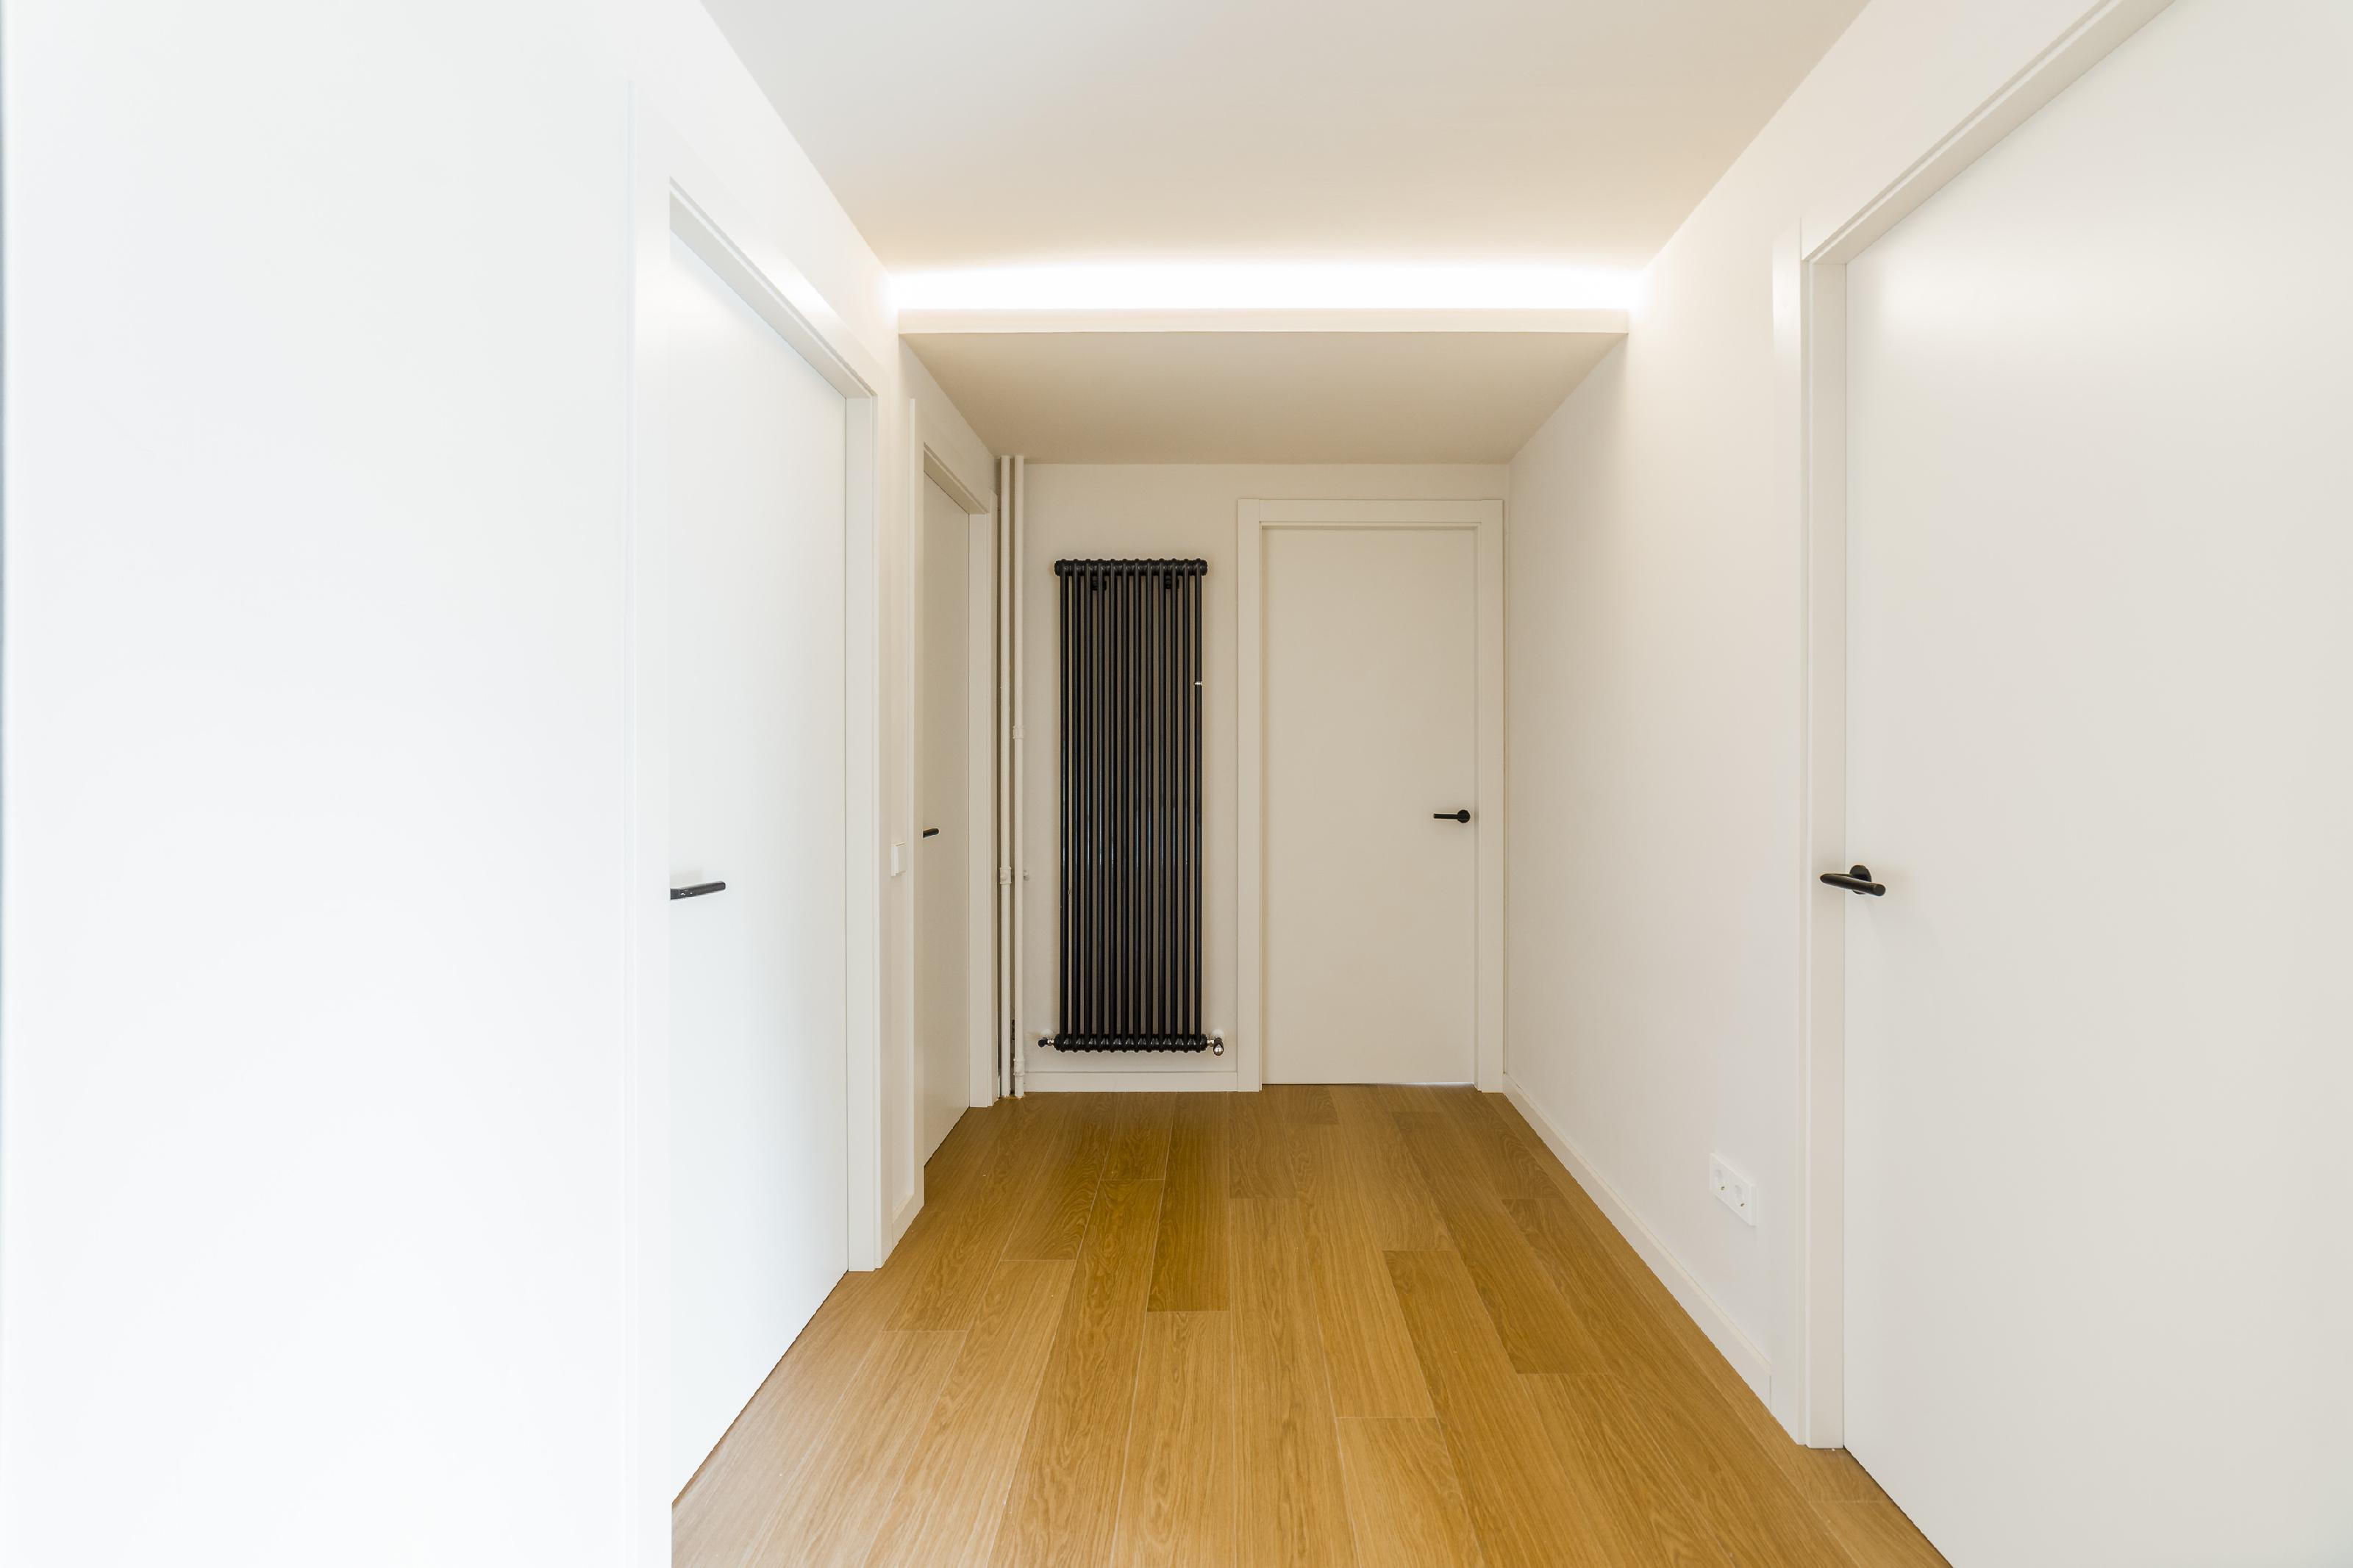 253492 Flat for sale in Sarrià-Sant Gervasi, Sant Gervasi-Galvany 23